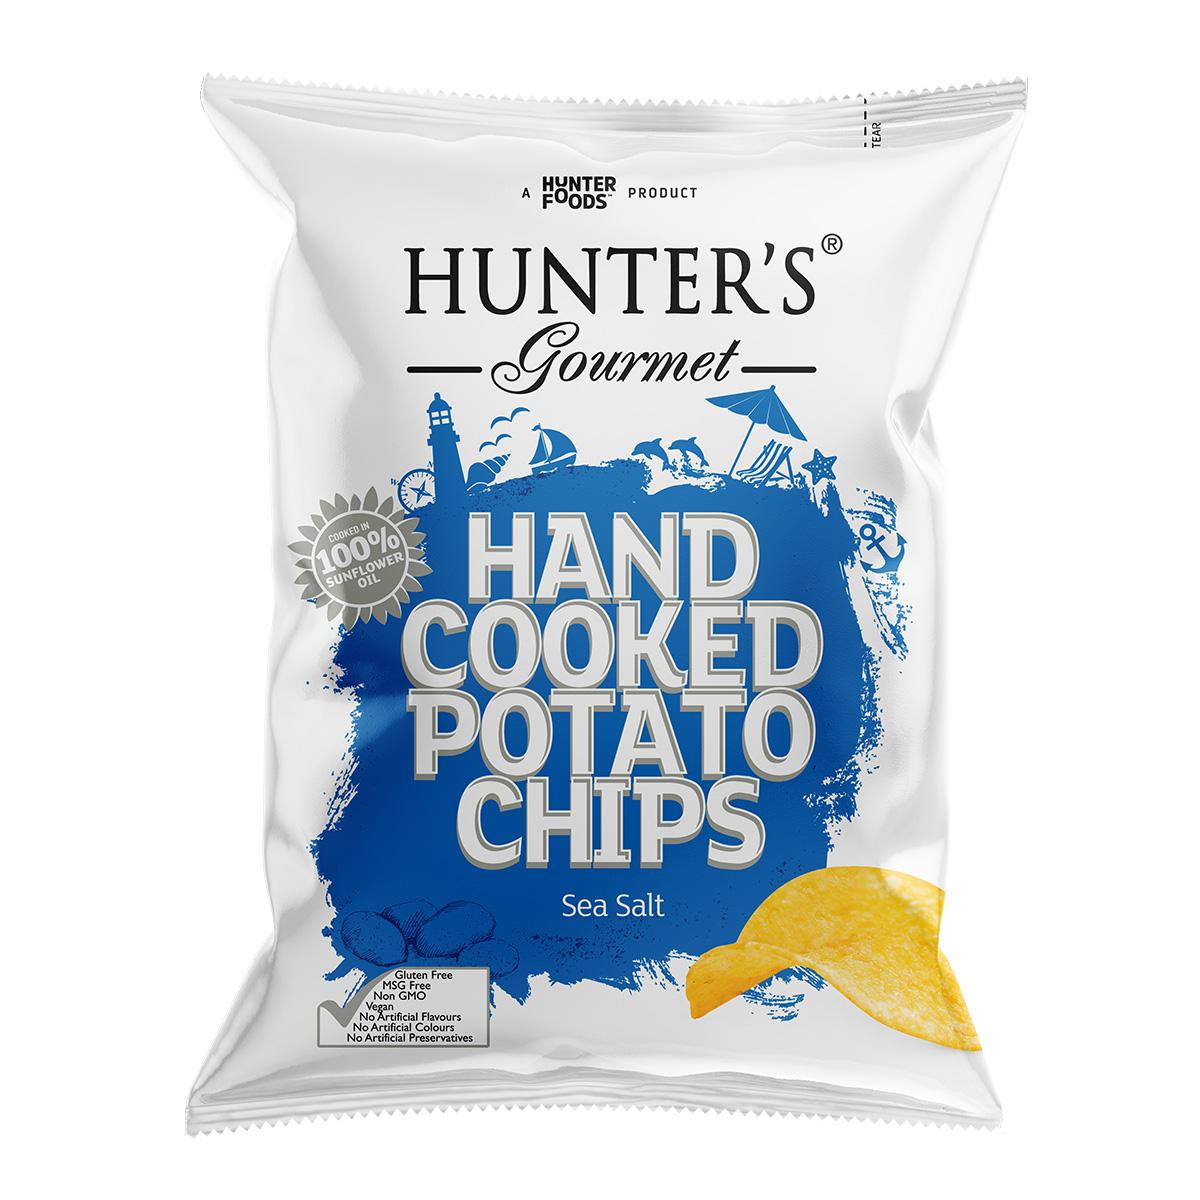 Hunter's Gourmet Hand Cooked Potato Chips - Sea Salt (125gm)